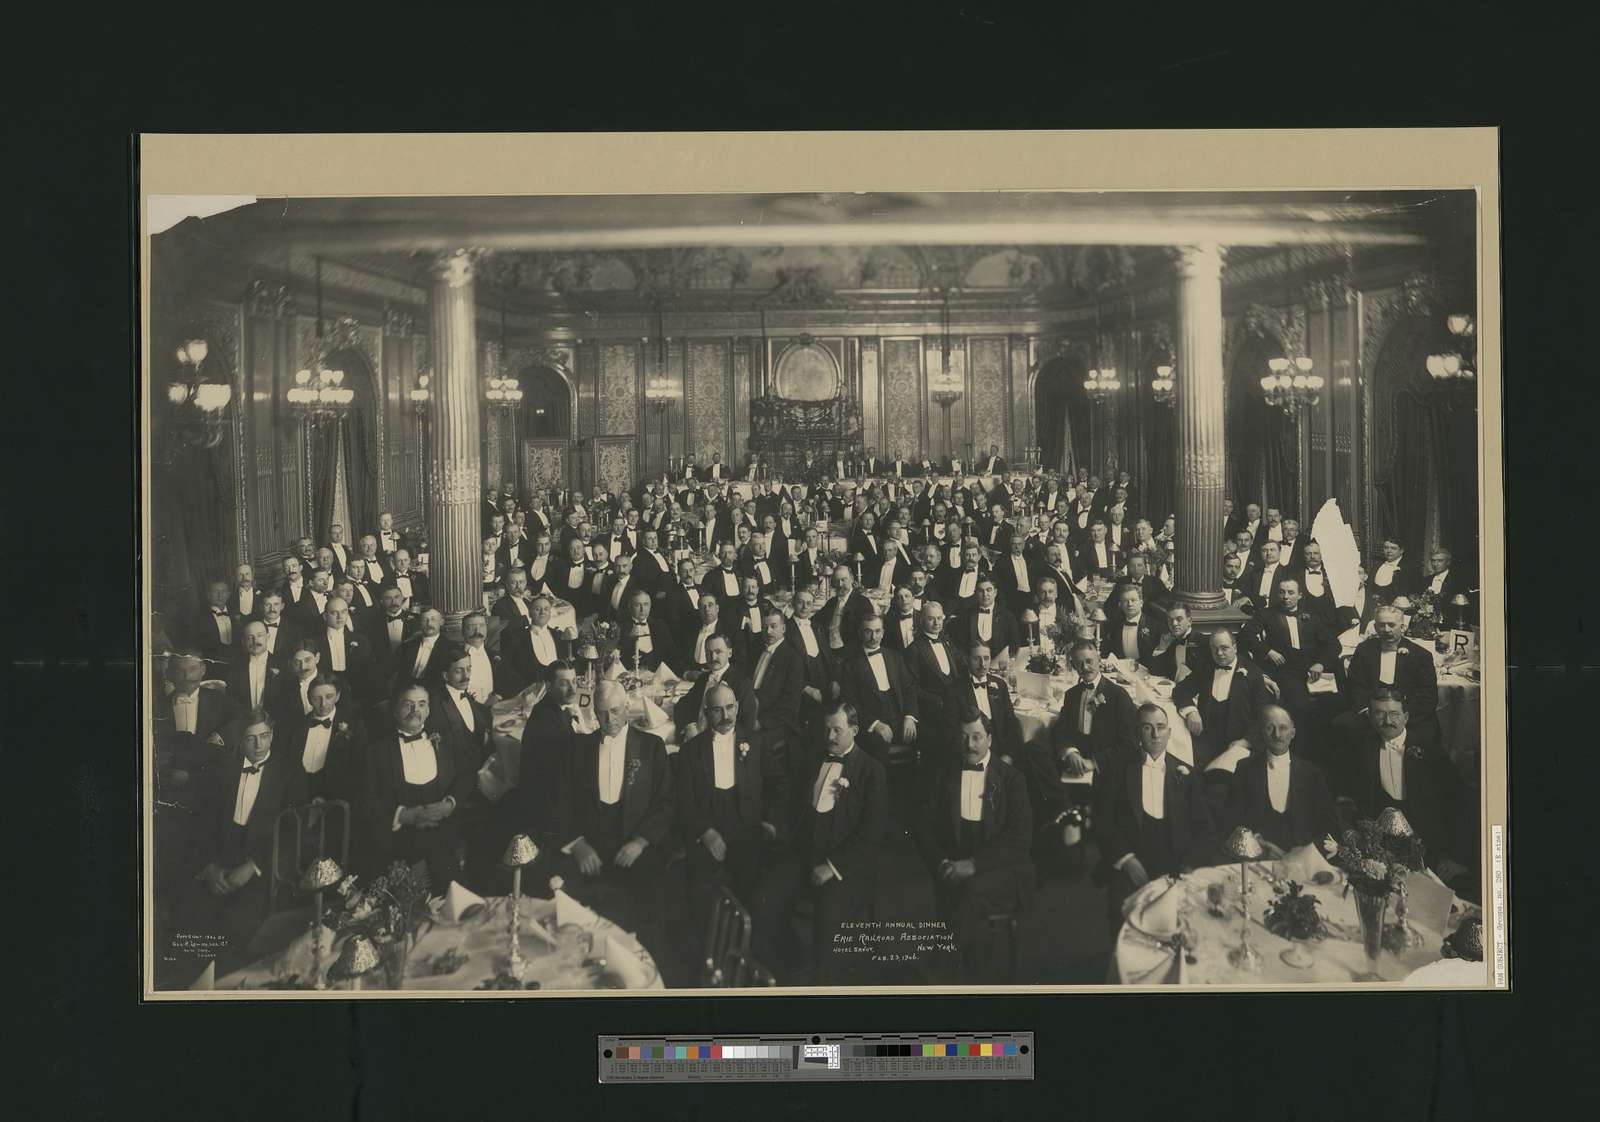 Eleventh Annual Dinner, Erie Railroad Association, Hotel Savoy, New York, Feb. 23, 1906